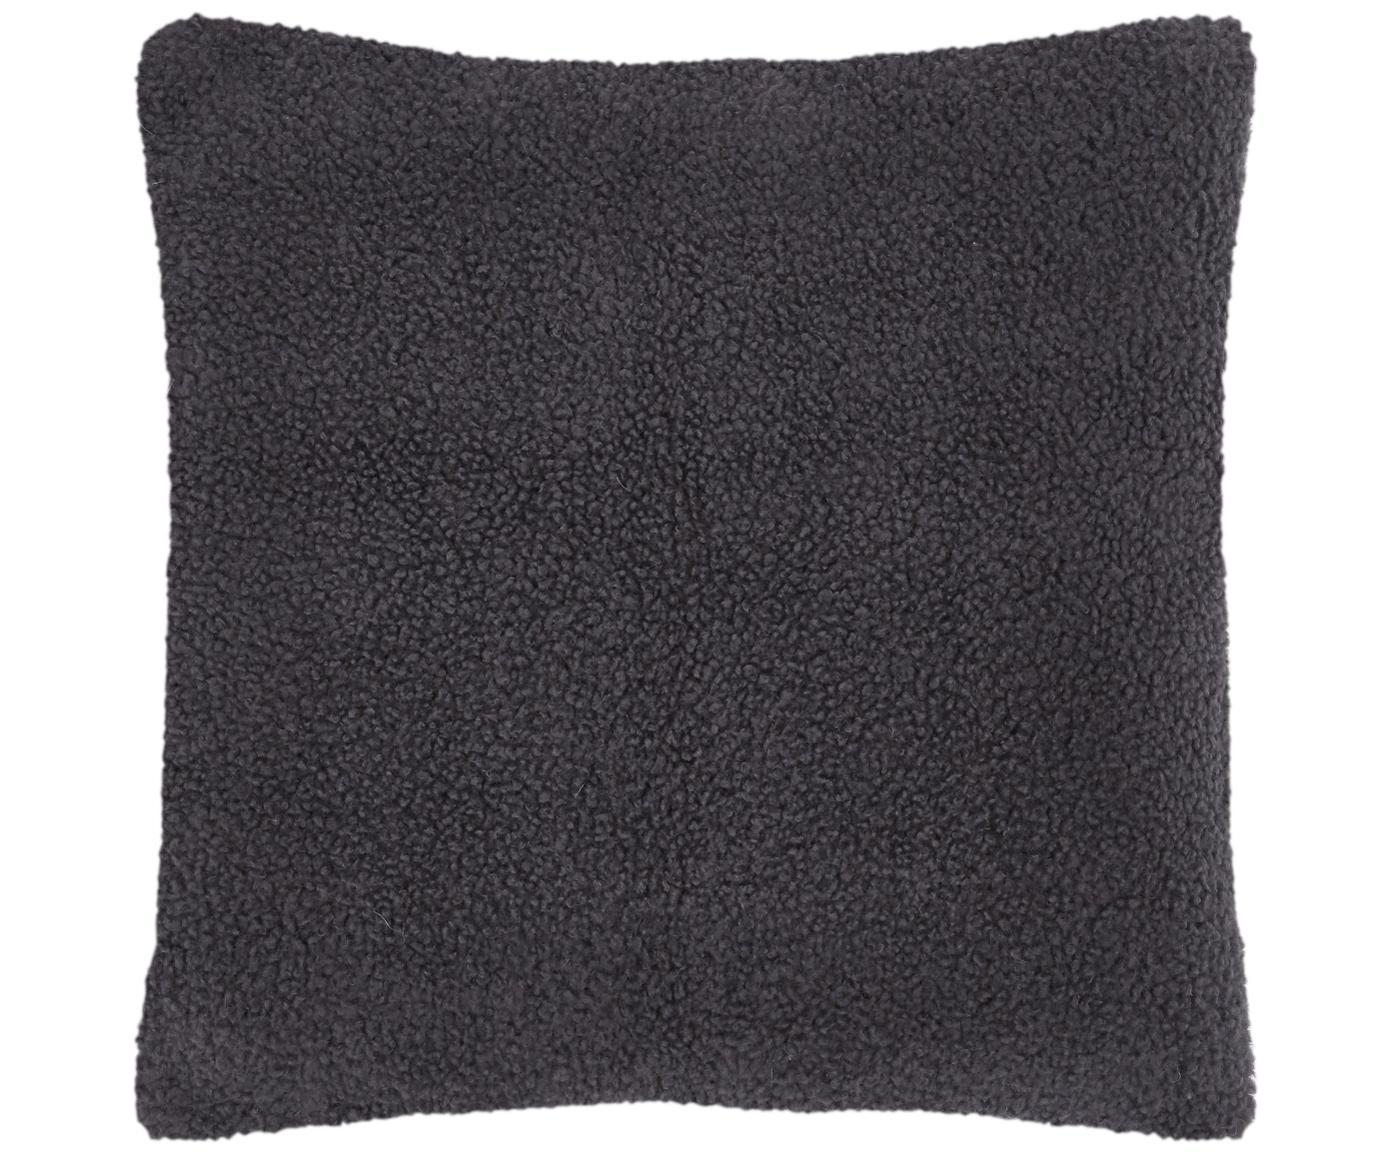 Flauschige Teddy-Kissenhülle Mille, Vorderseite: 100% Polyester (Teddyfell, Rückseite: 100% Polyester (Teddyfell, Dunkelgrau, 60 x 60 cm